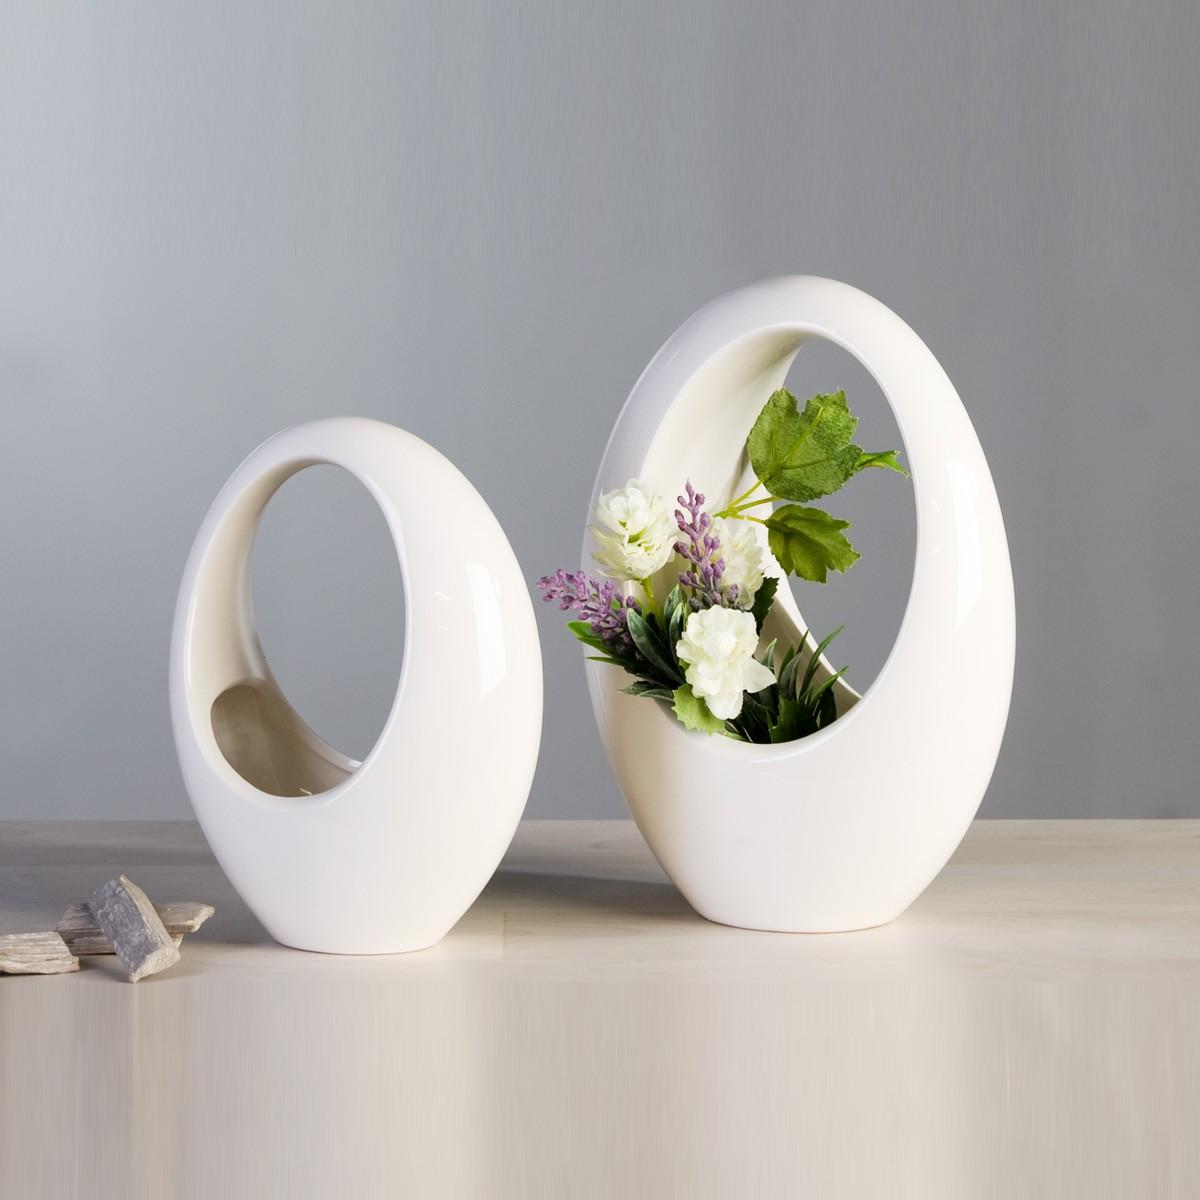 Vase kilmacolm wei glasiert - Ovale wandregale ...